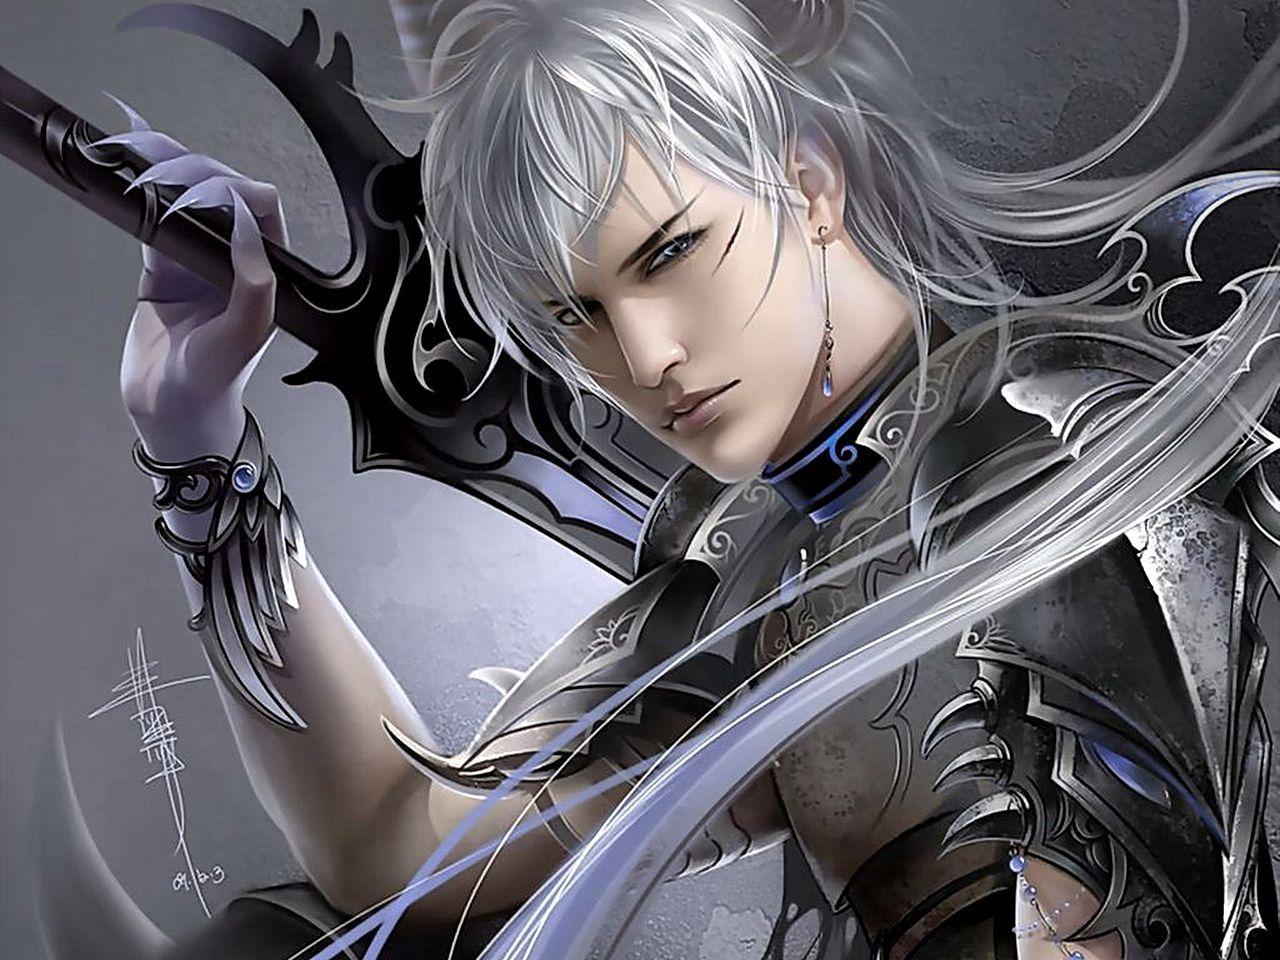 Male Elf Pictures Warrior Elf Wallpaper Size 1280x960px Wallpapers Fantasy Art Men Anime Warrior Anime Fantasy